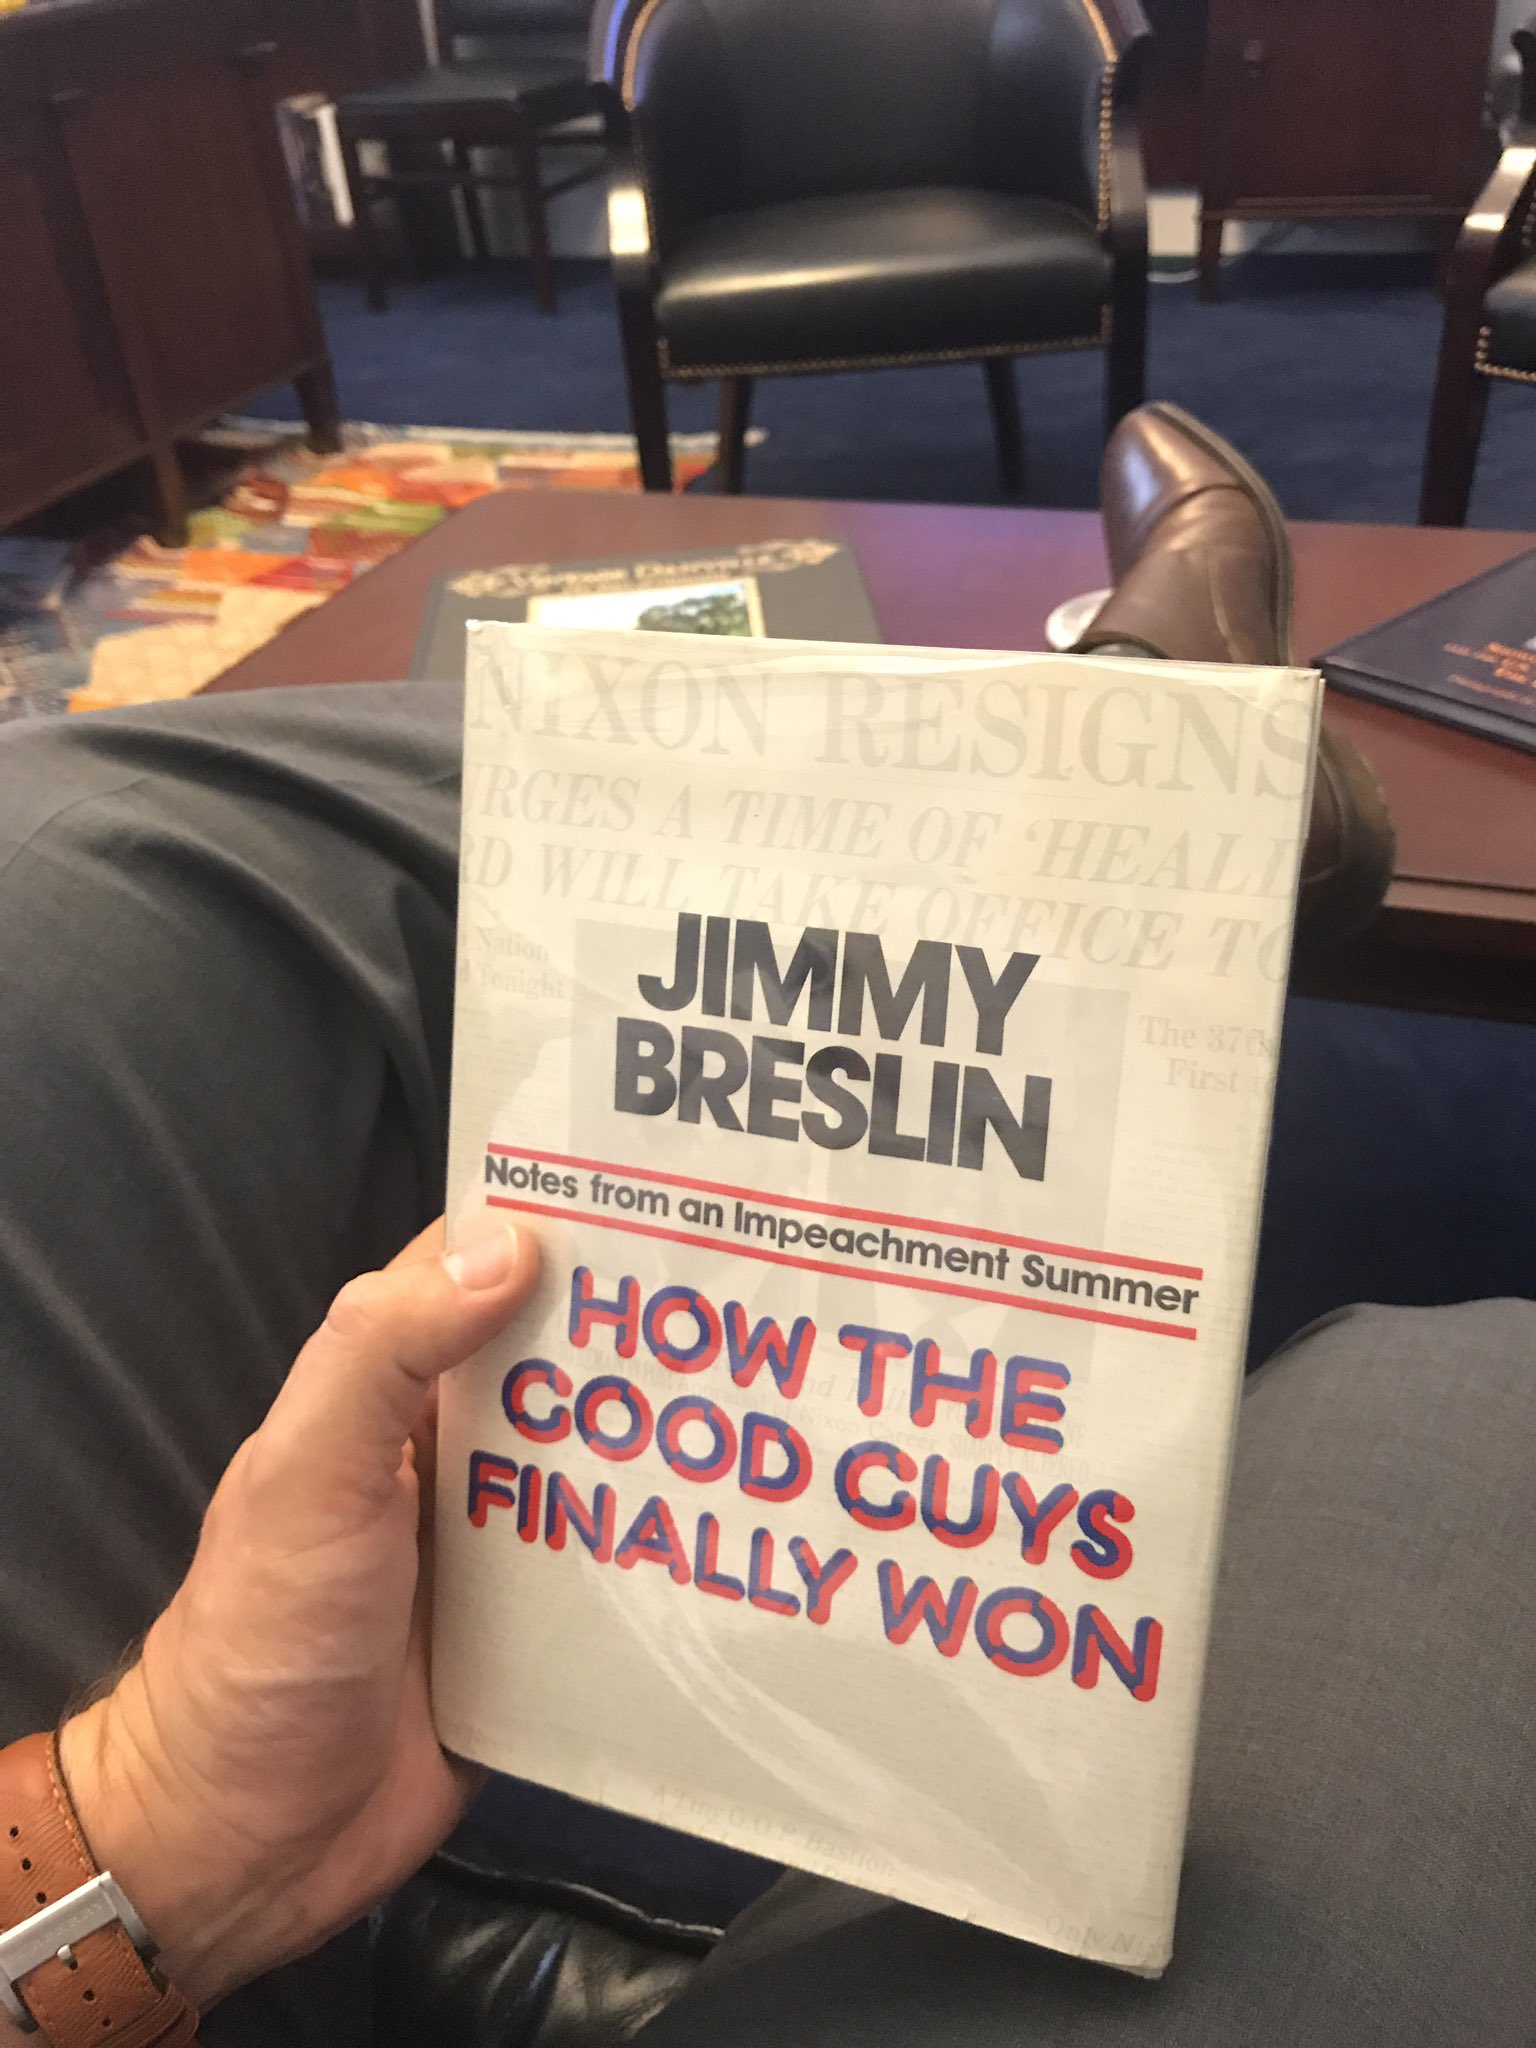 A good read to celebrate #independentbookstoreday https://t.co/jfZcI14JlS